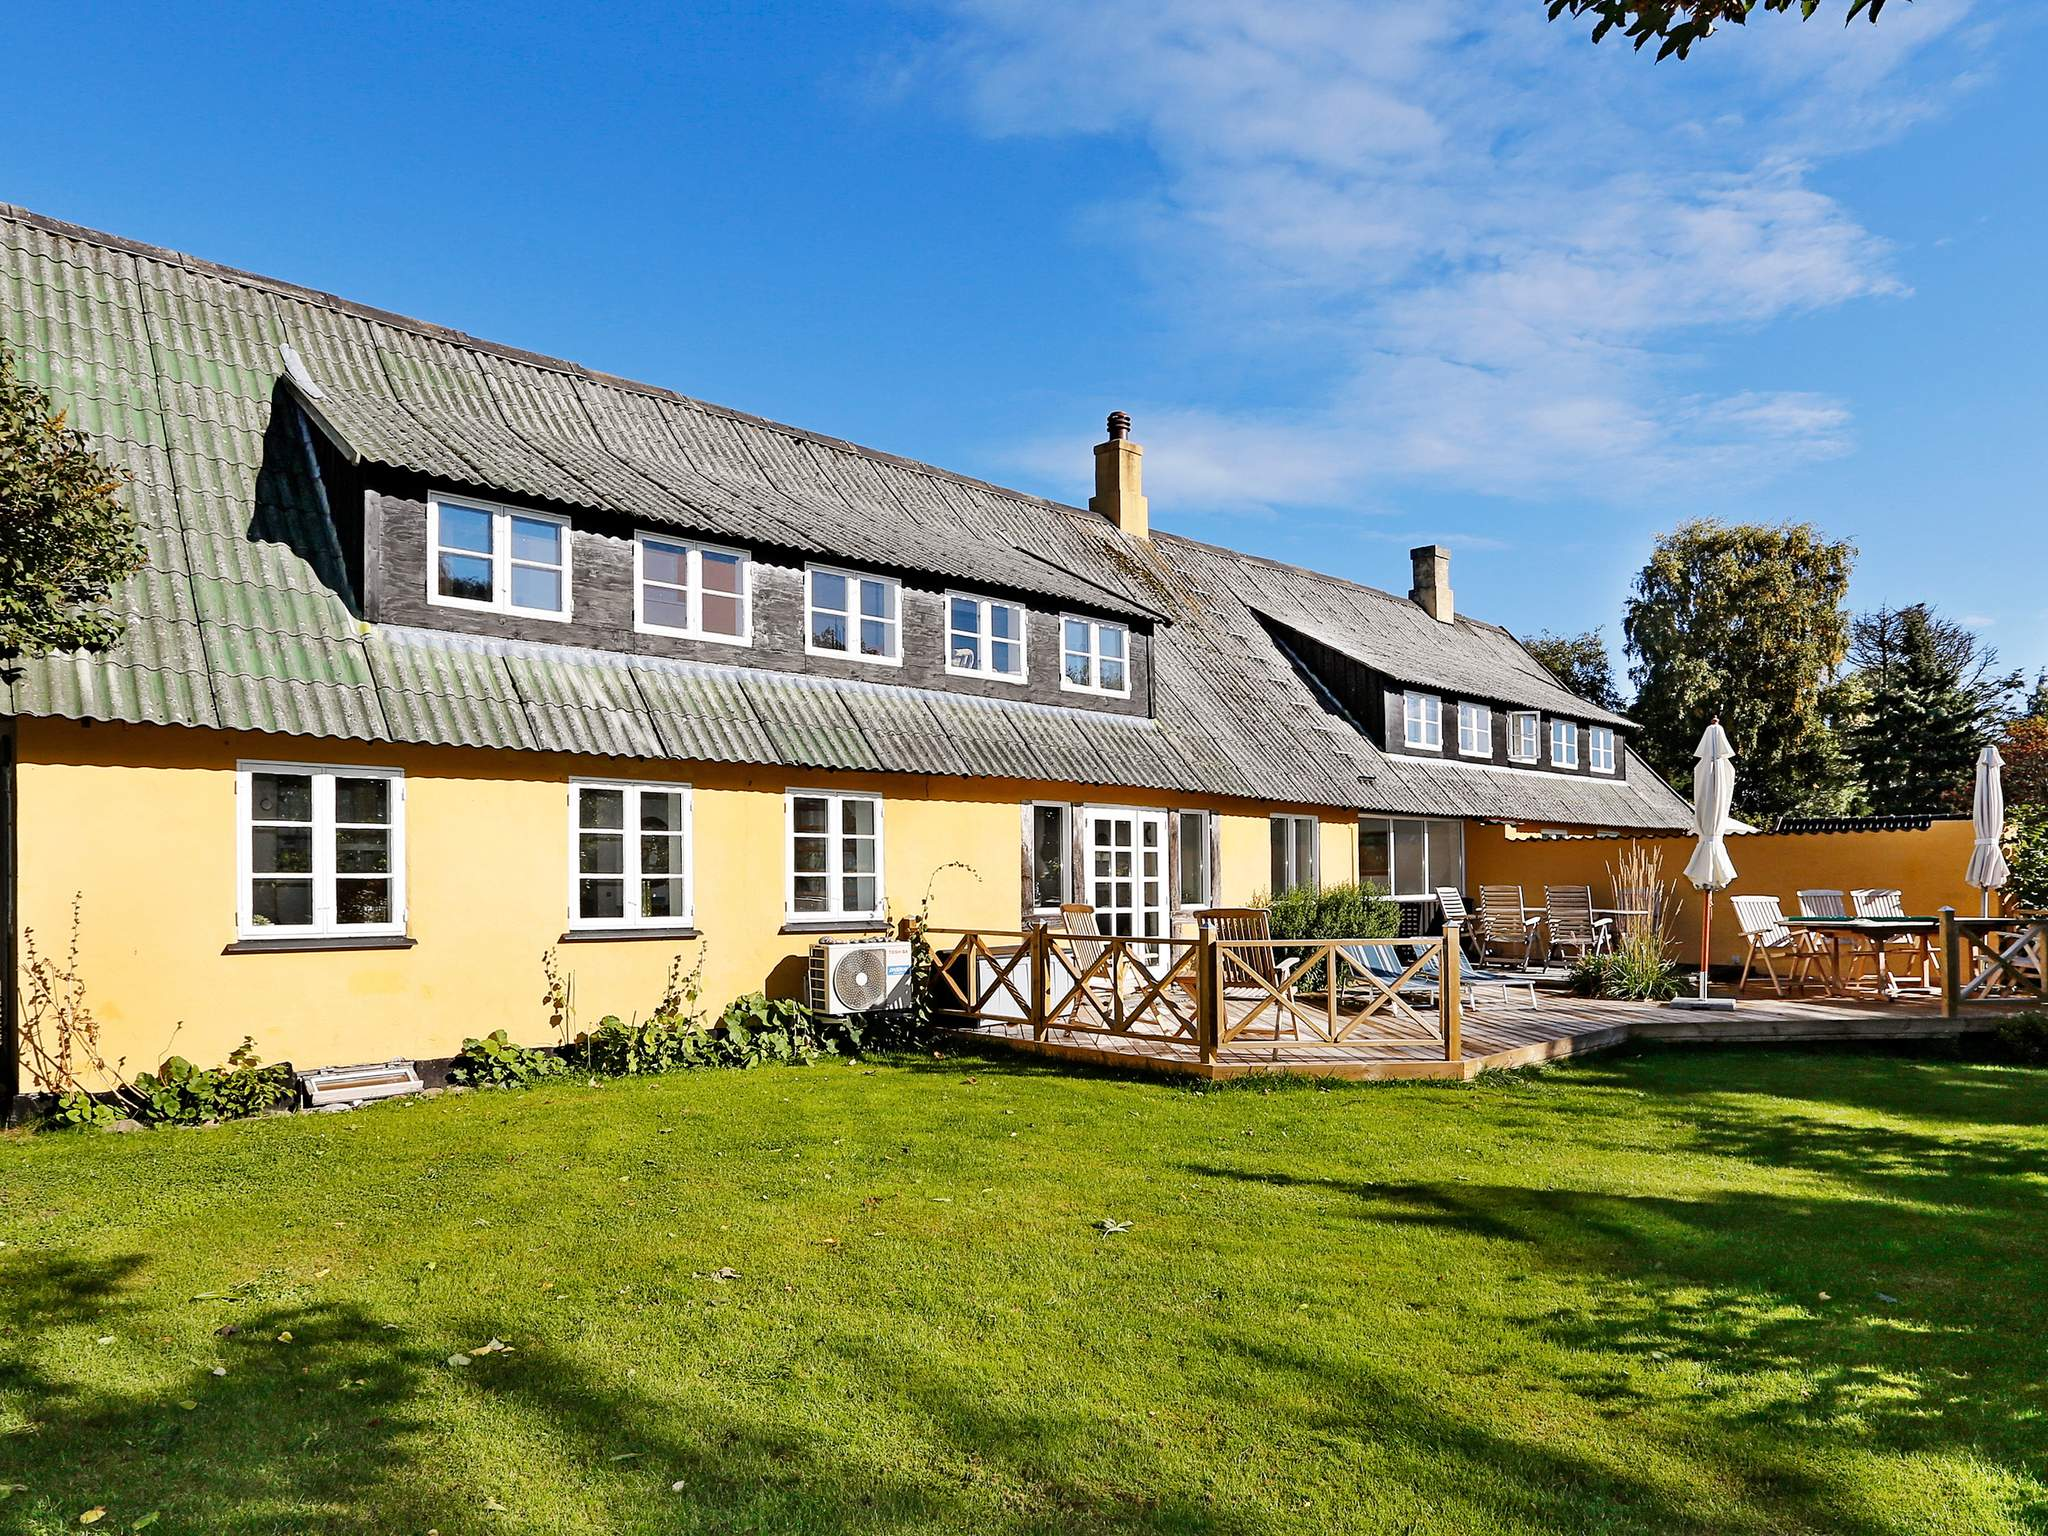 Ferienhaus Vejby Strand (771891), Vejby, , Nordseeland, Dänemark, Bild 23